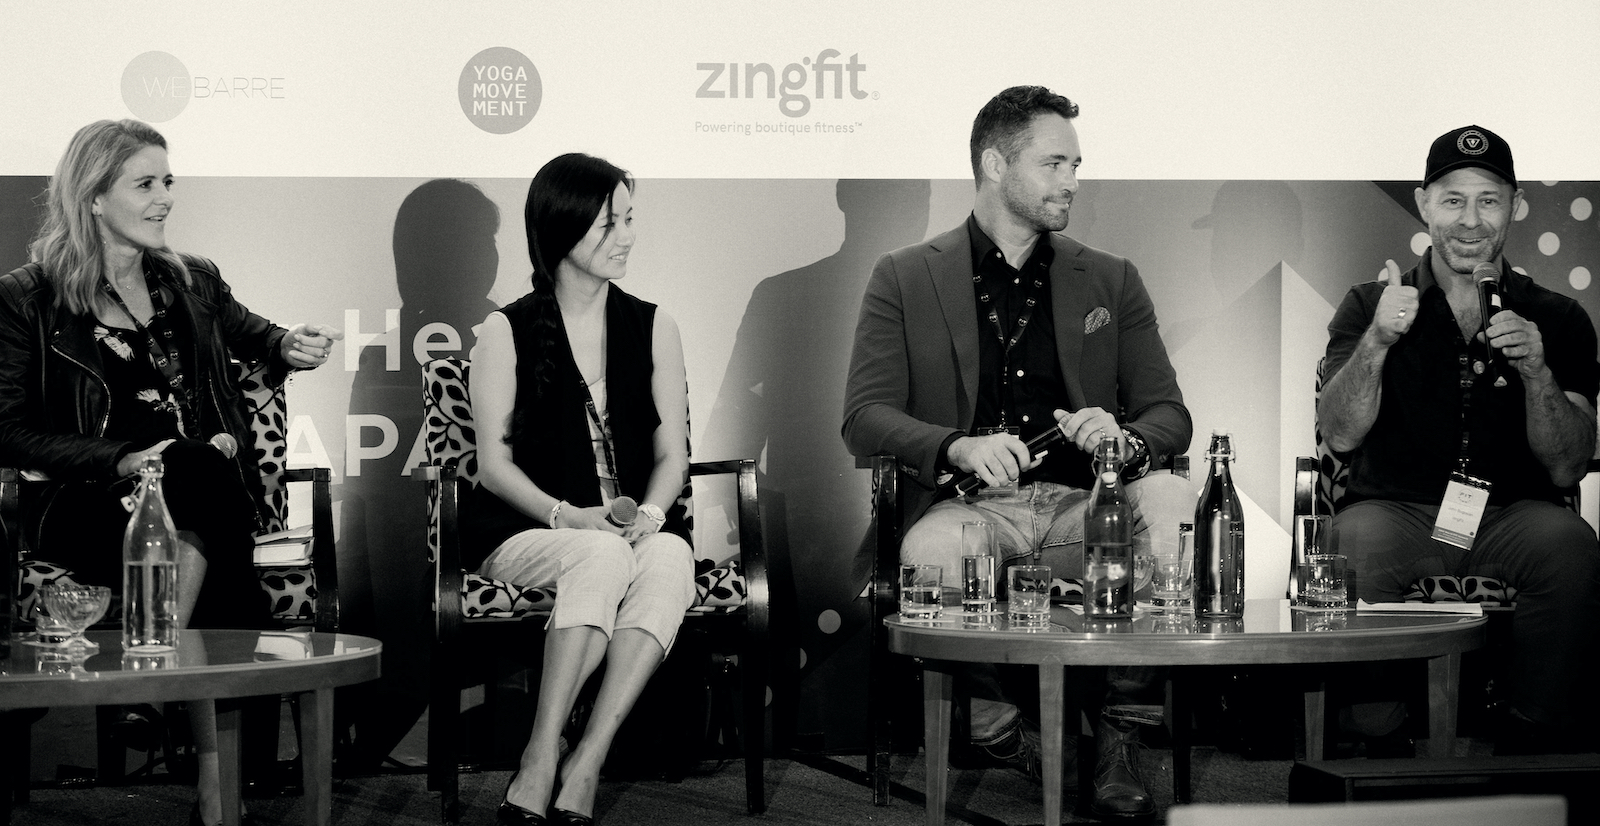 Letter From John Bogosian, zingfit Founder & CEO